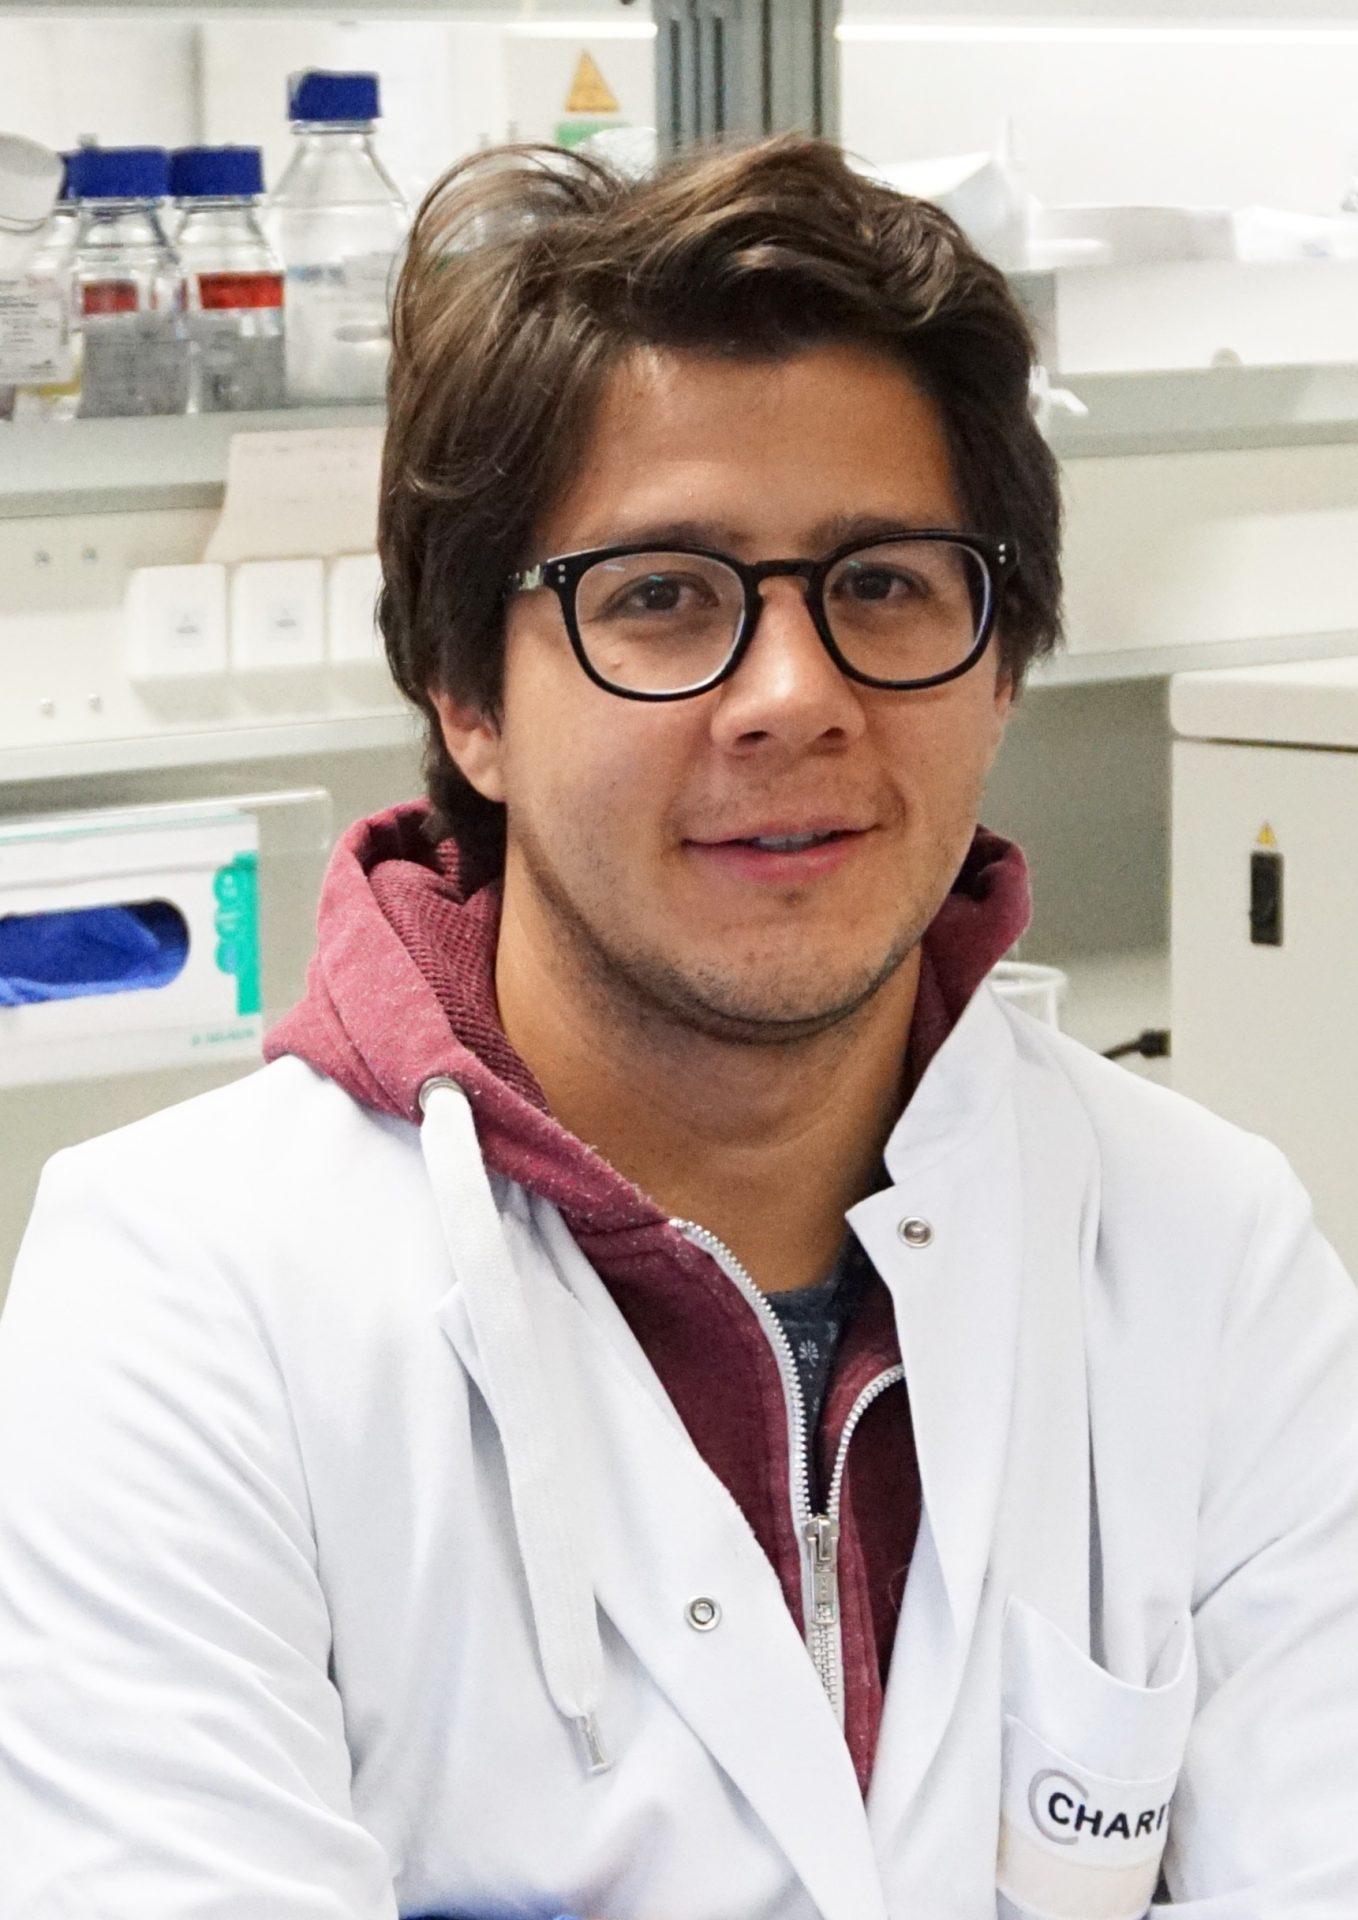 Fabian Guendel Rojas